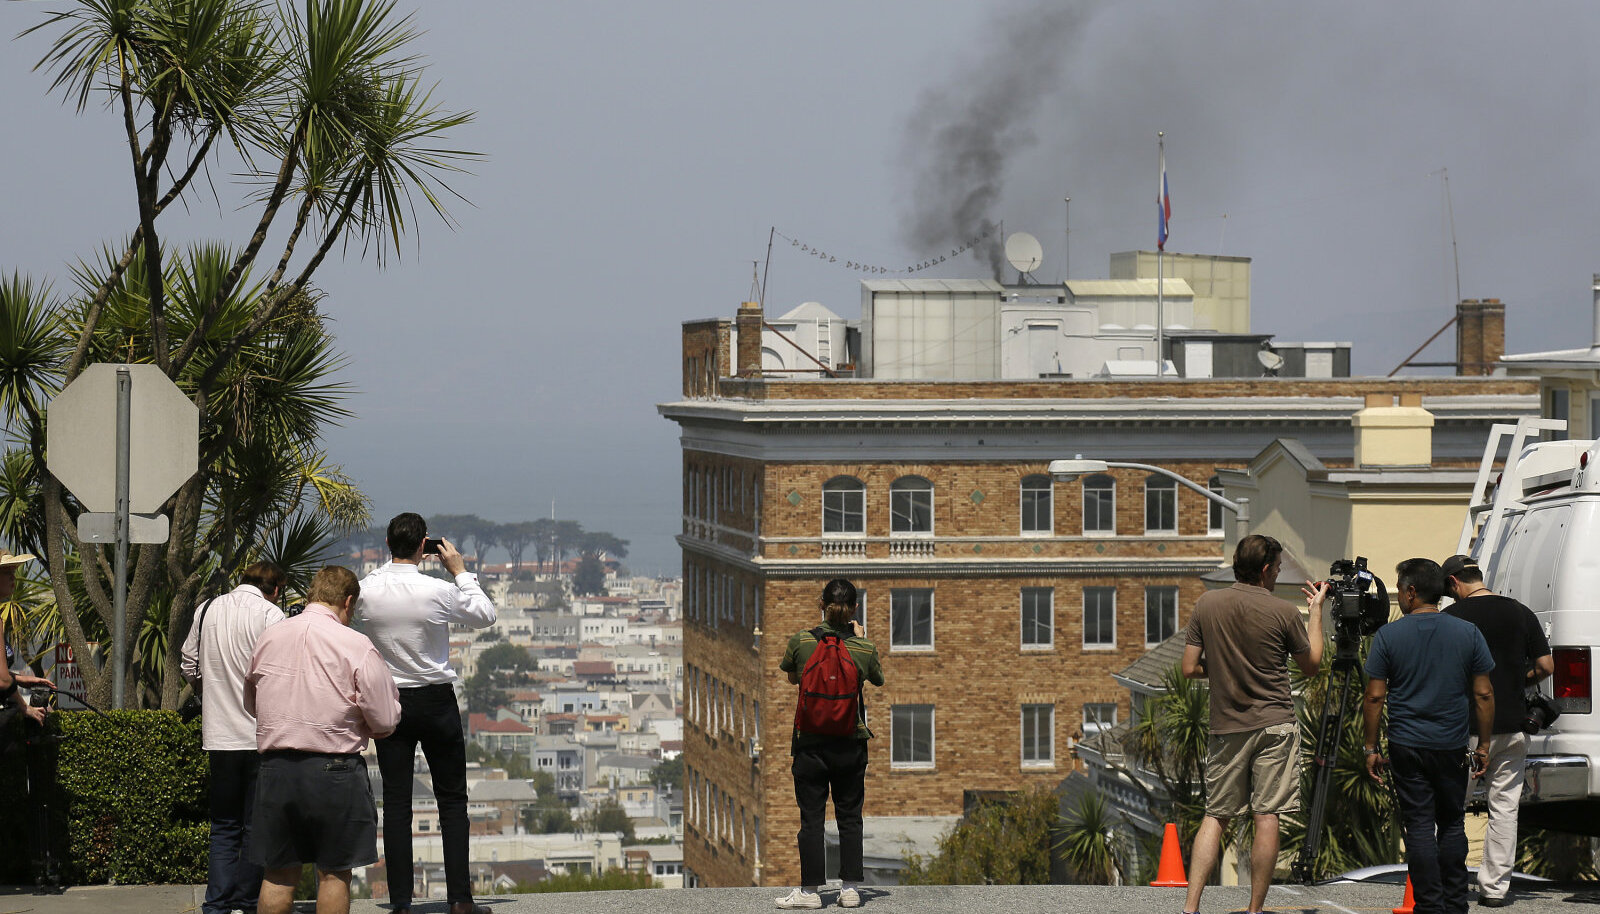 Venemaa saatkond San Fransiscos